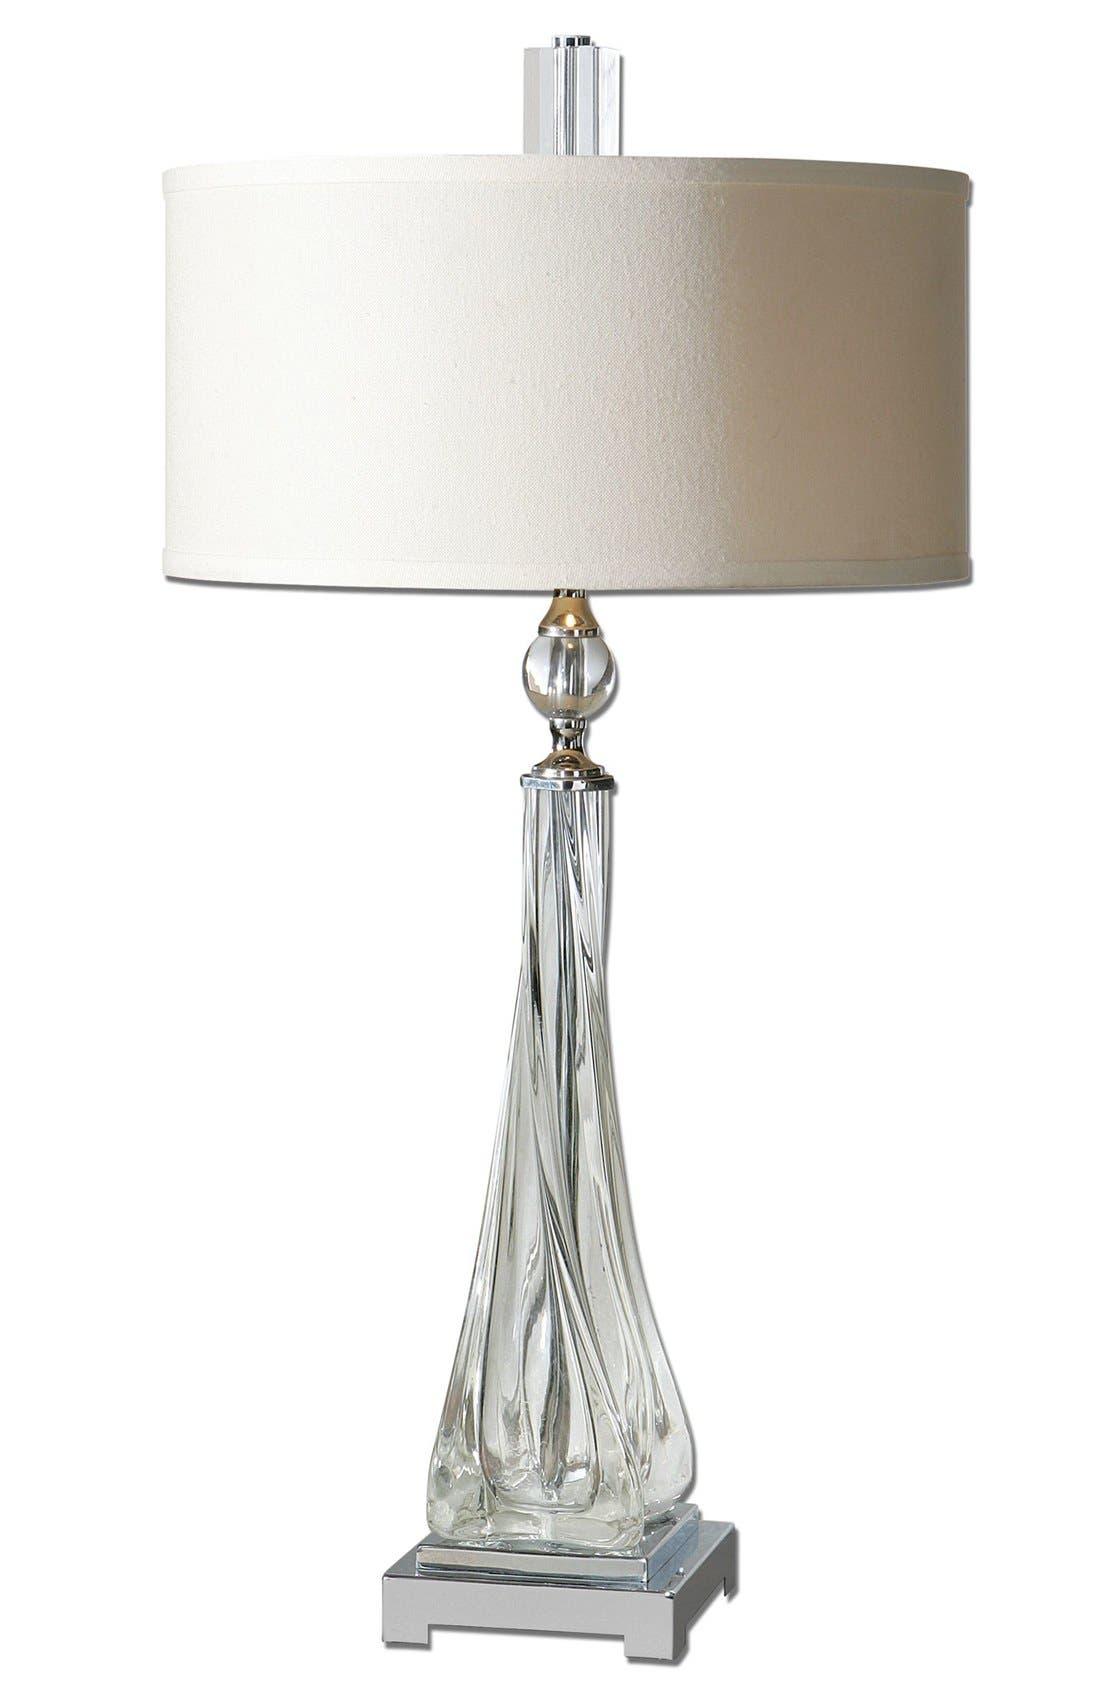 Uttermost 'Grancona' Glass Table Lamp